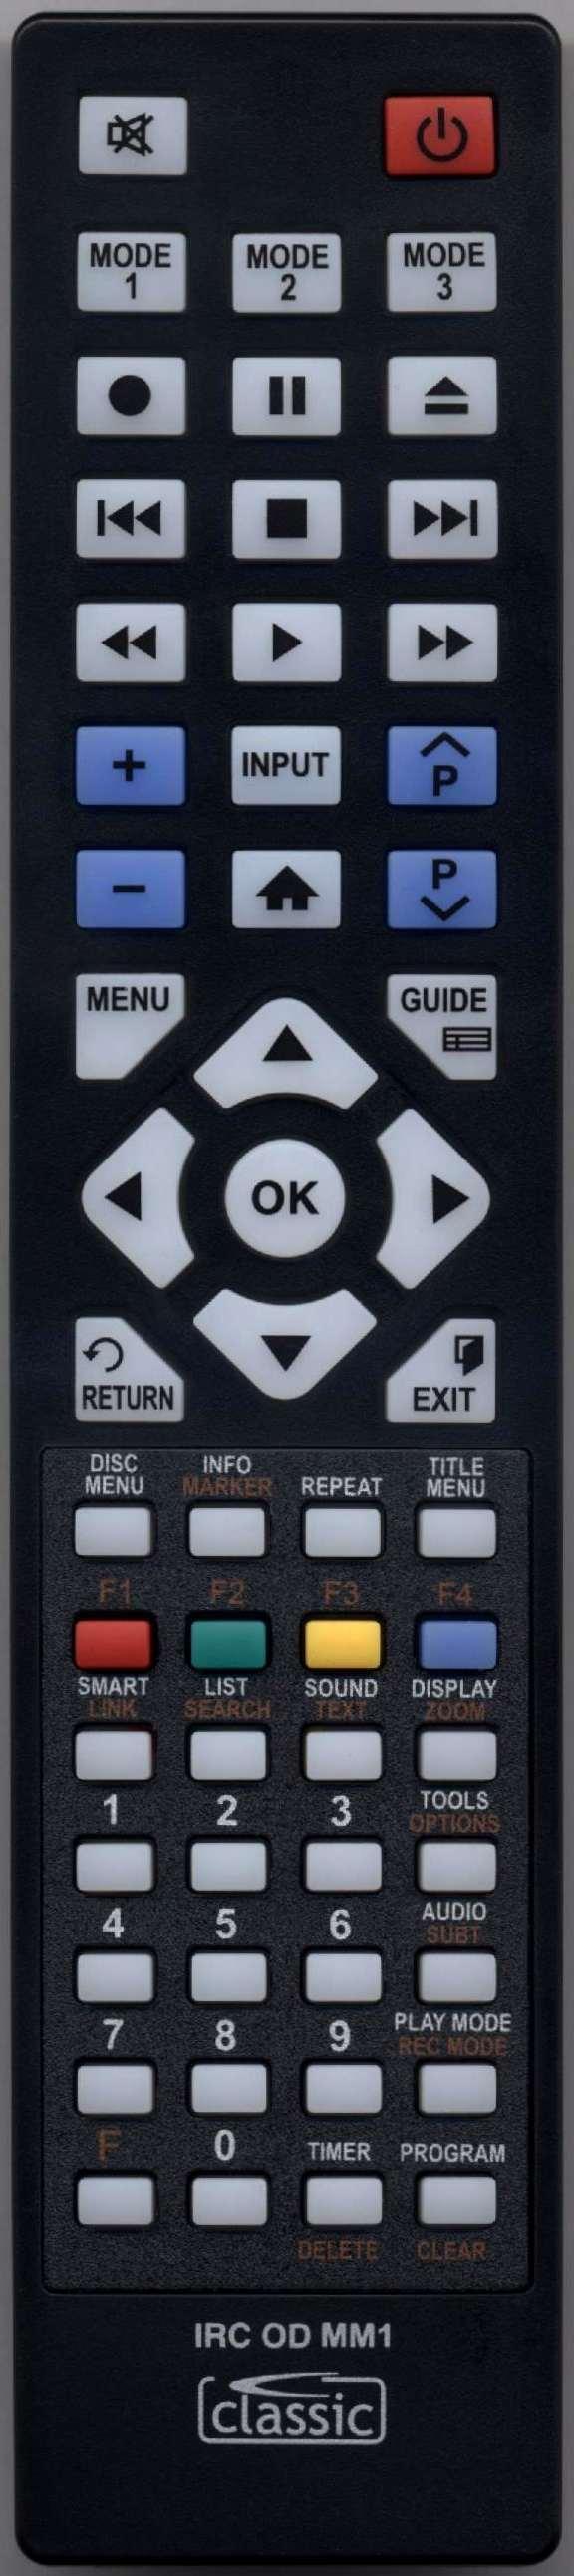 SAMSUNG BDC5500 Remote Control Alternative